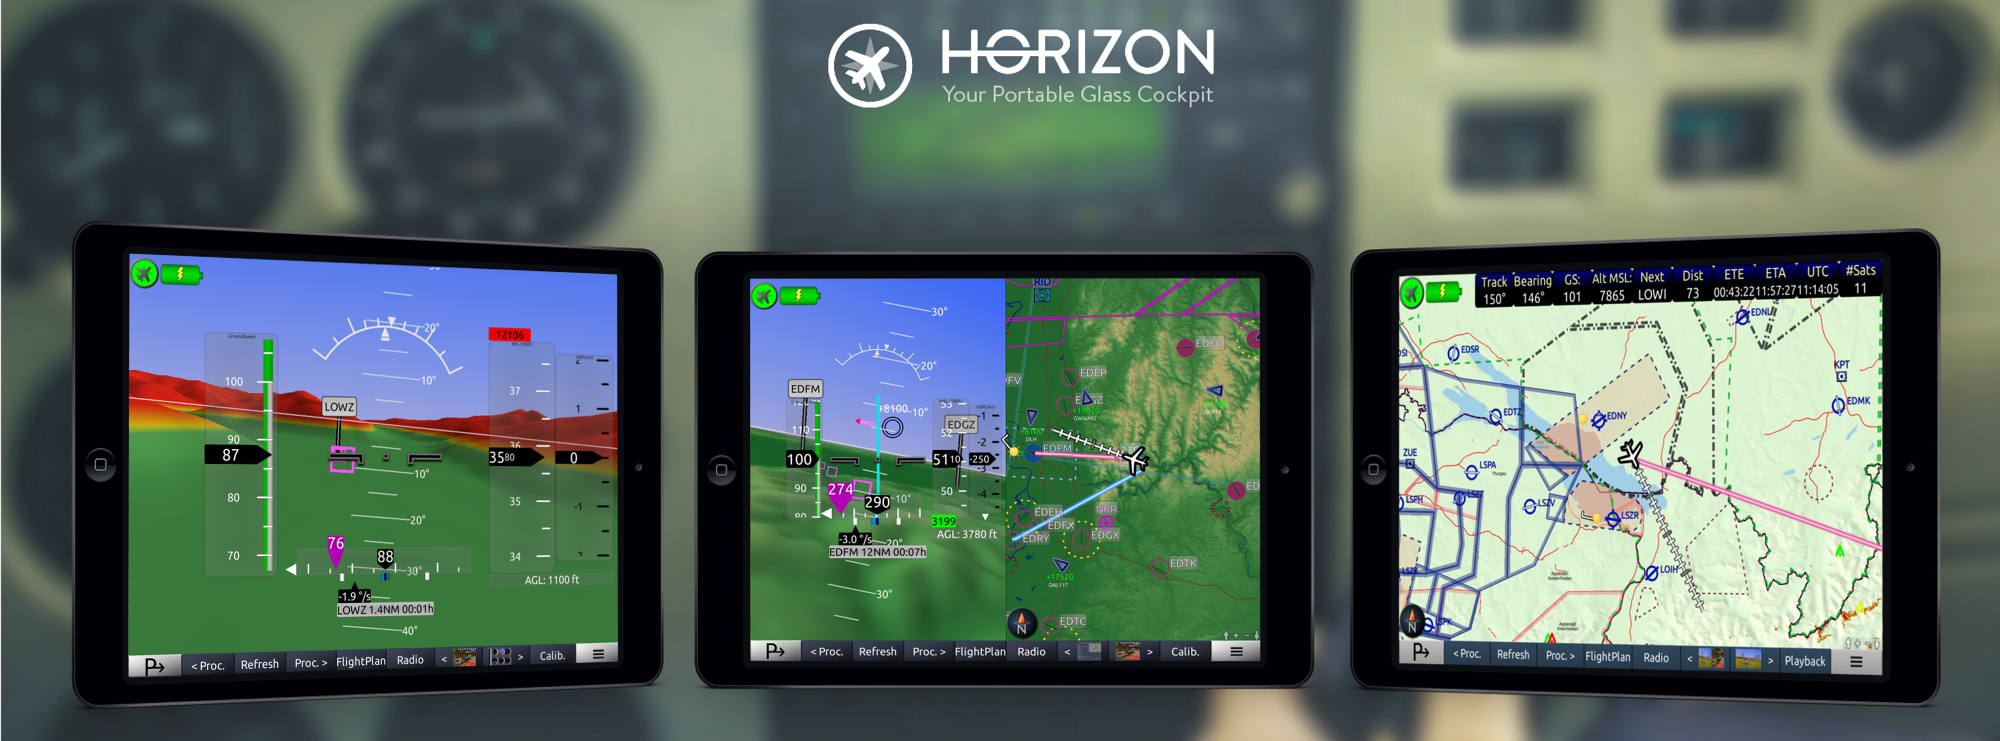 Horizon Portable Glass Cockpit Mockup v4